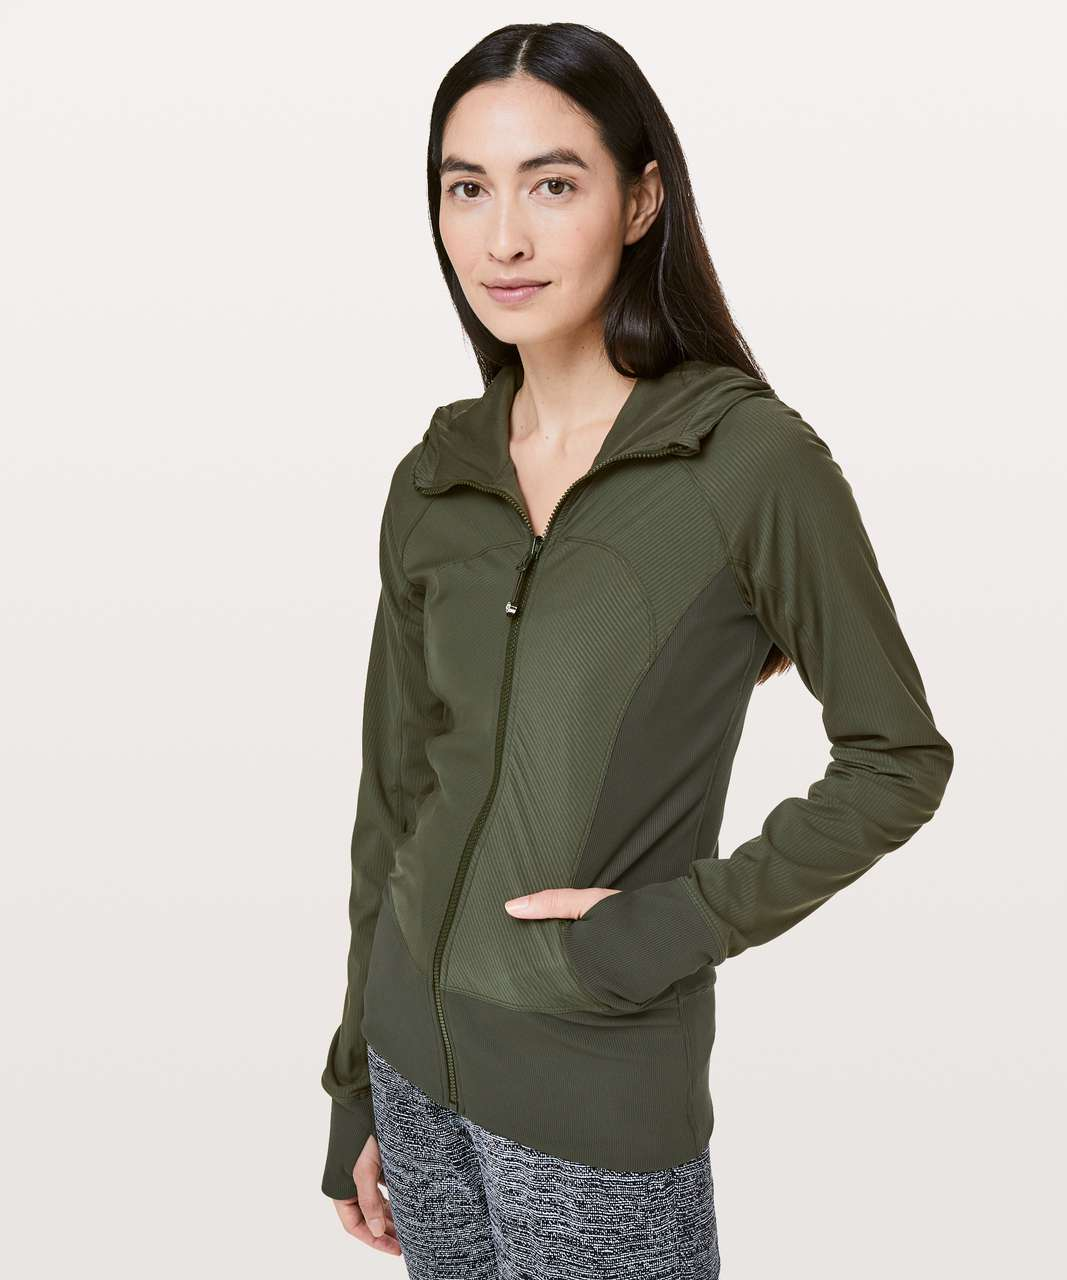 Lululemon In Flux Jacket - Gator Green